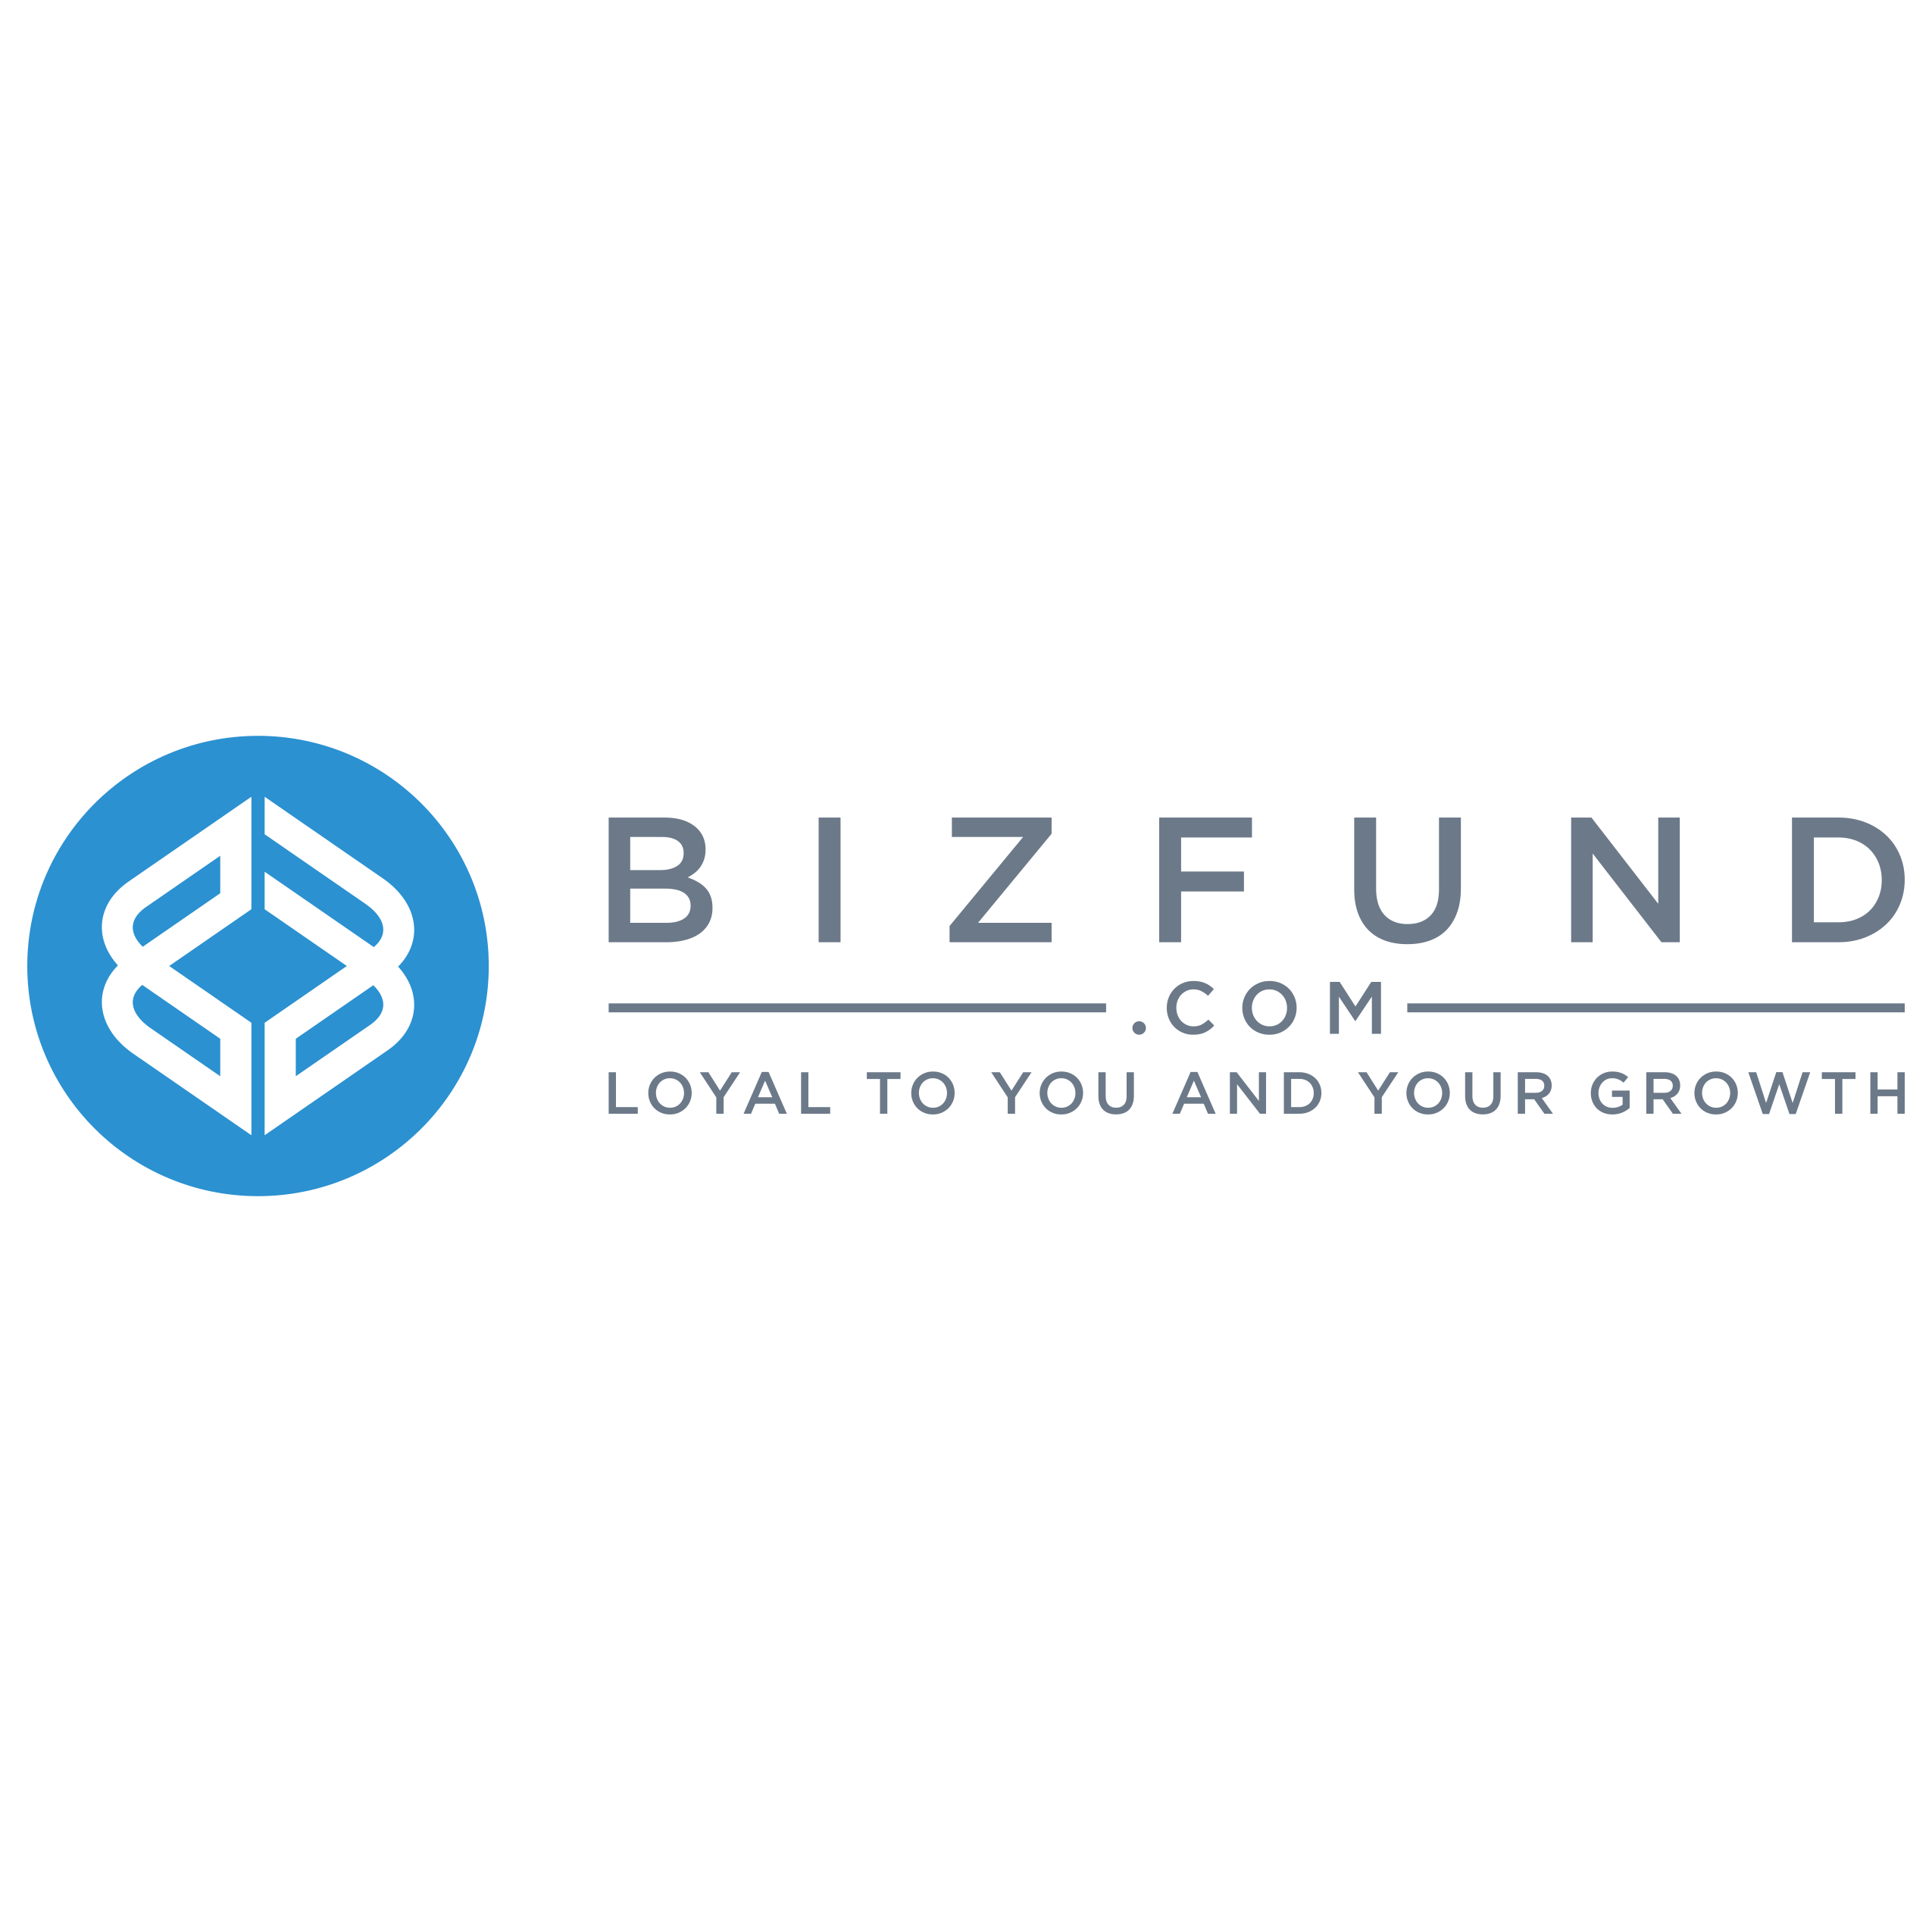 Create a new modern logo for a Cash Advance company Bizfund